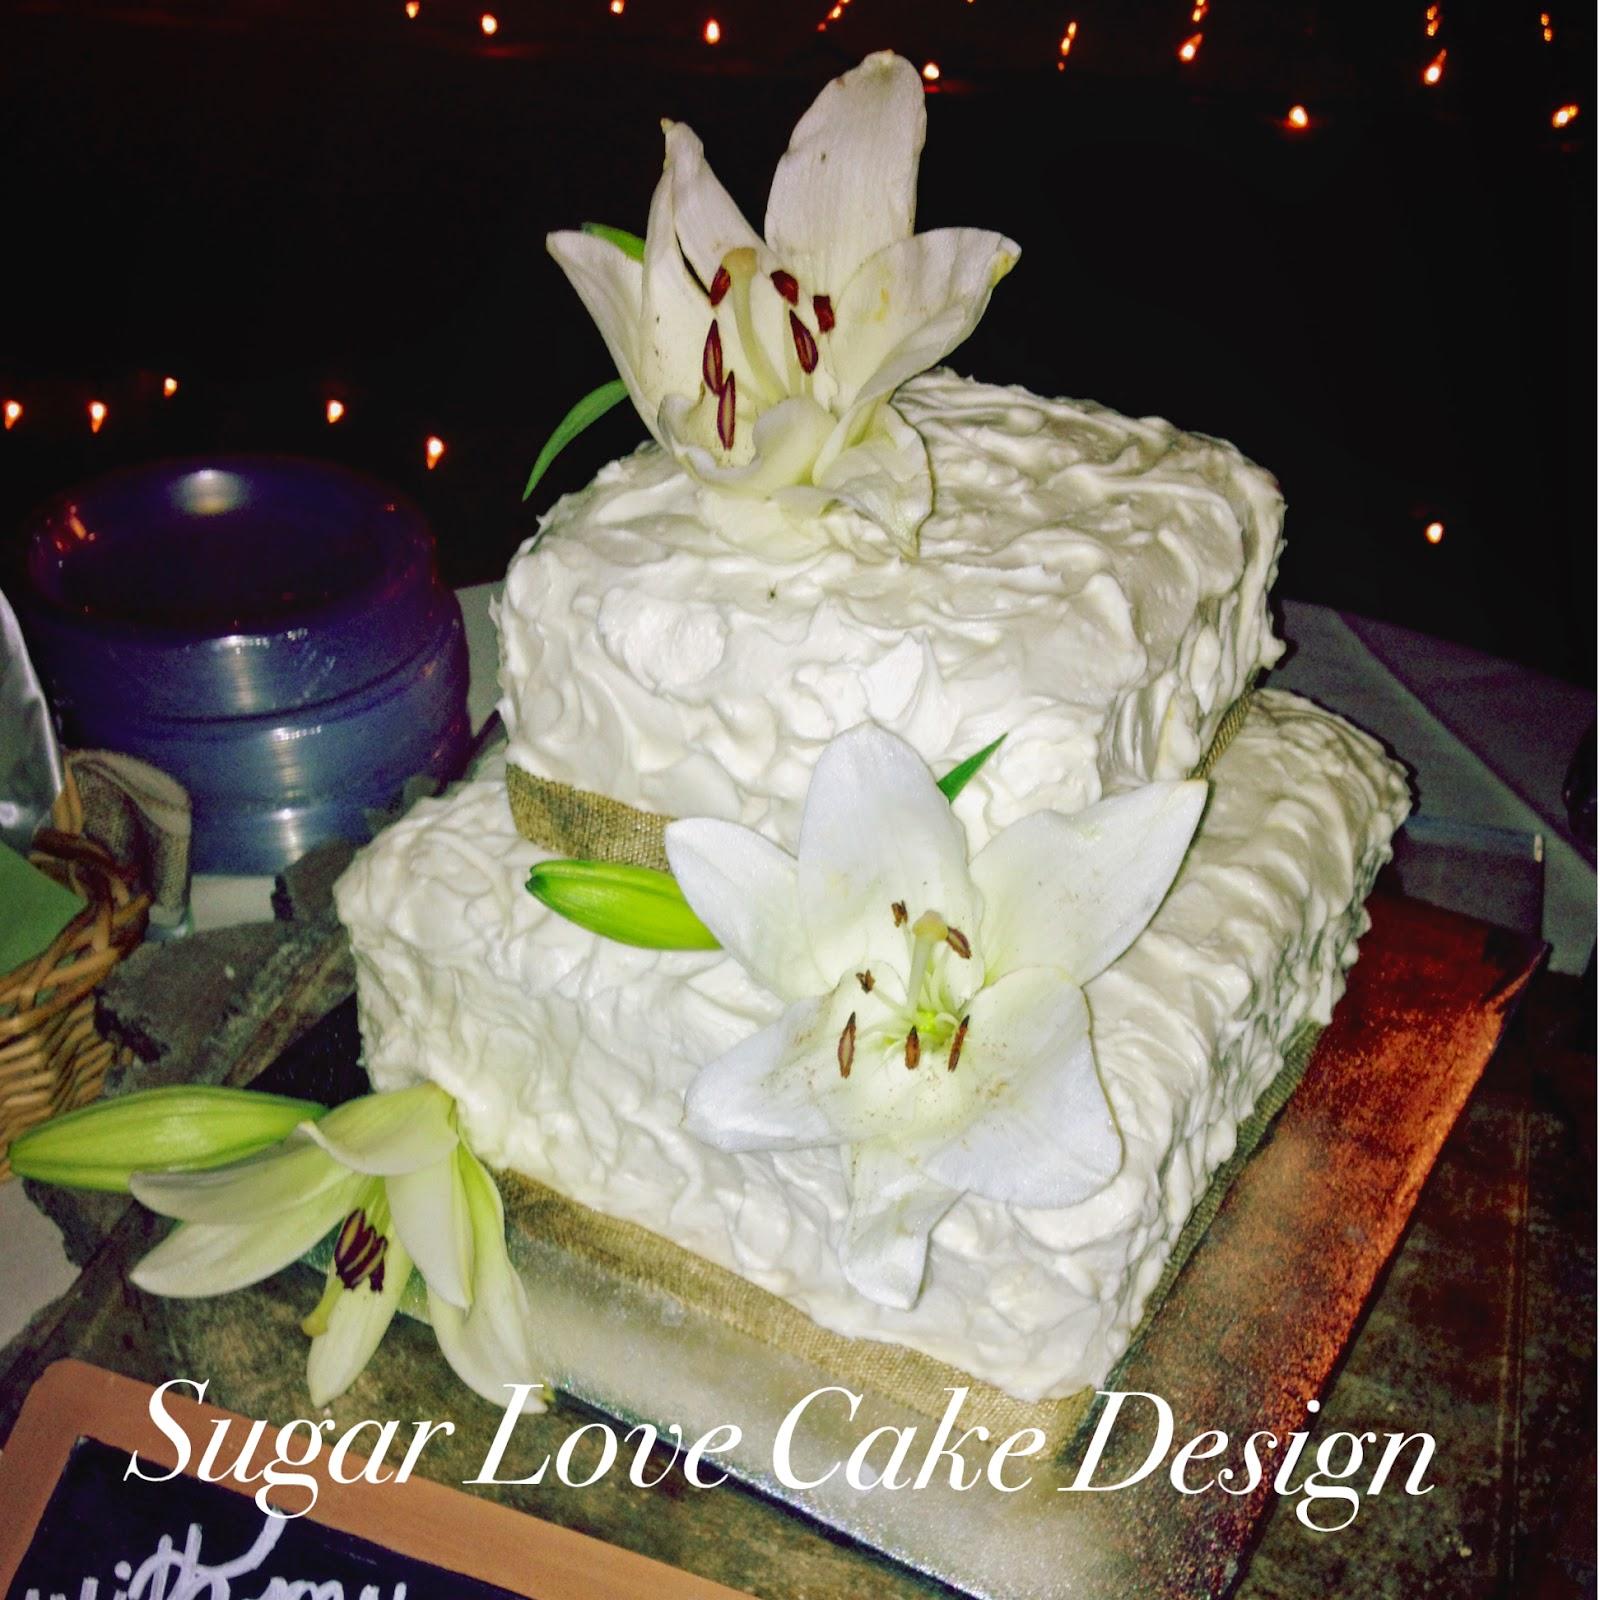 Sugar Love Cake Design Stargazer Lily Rustic Wedding Cake